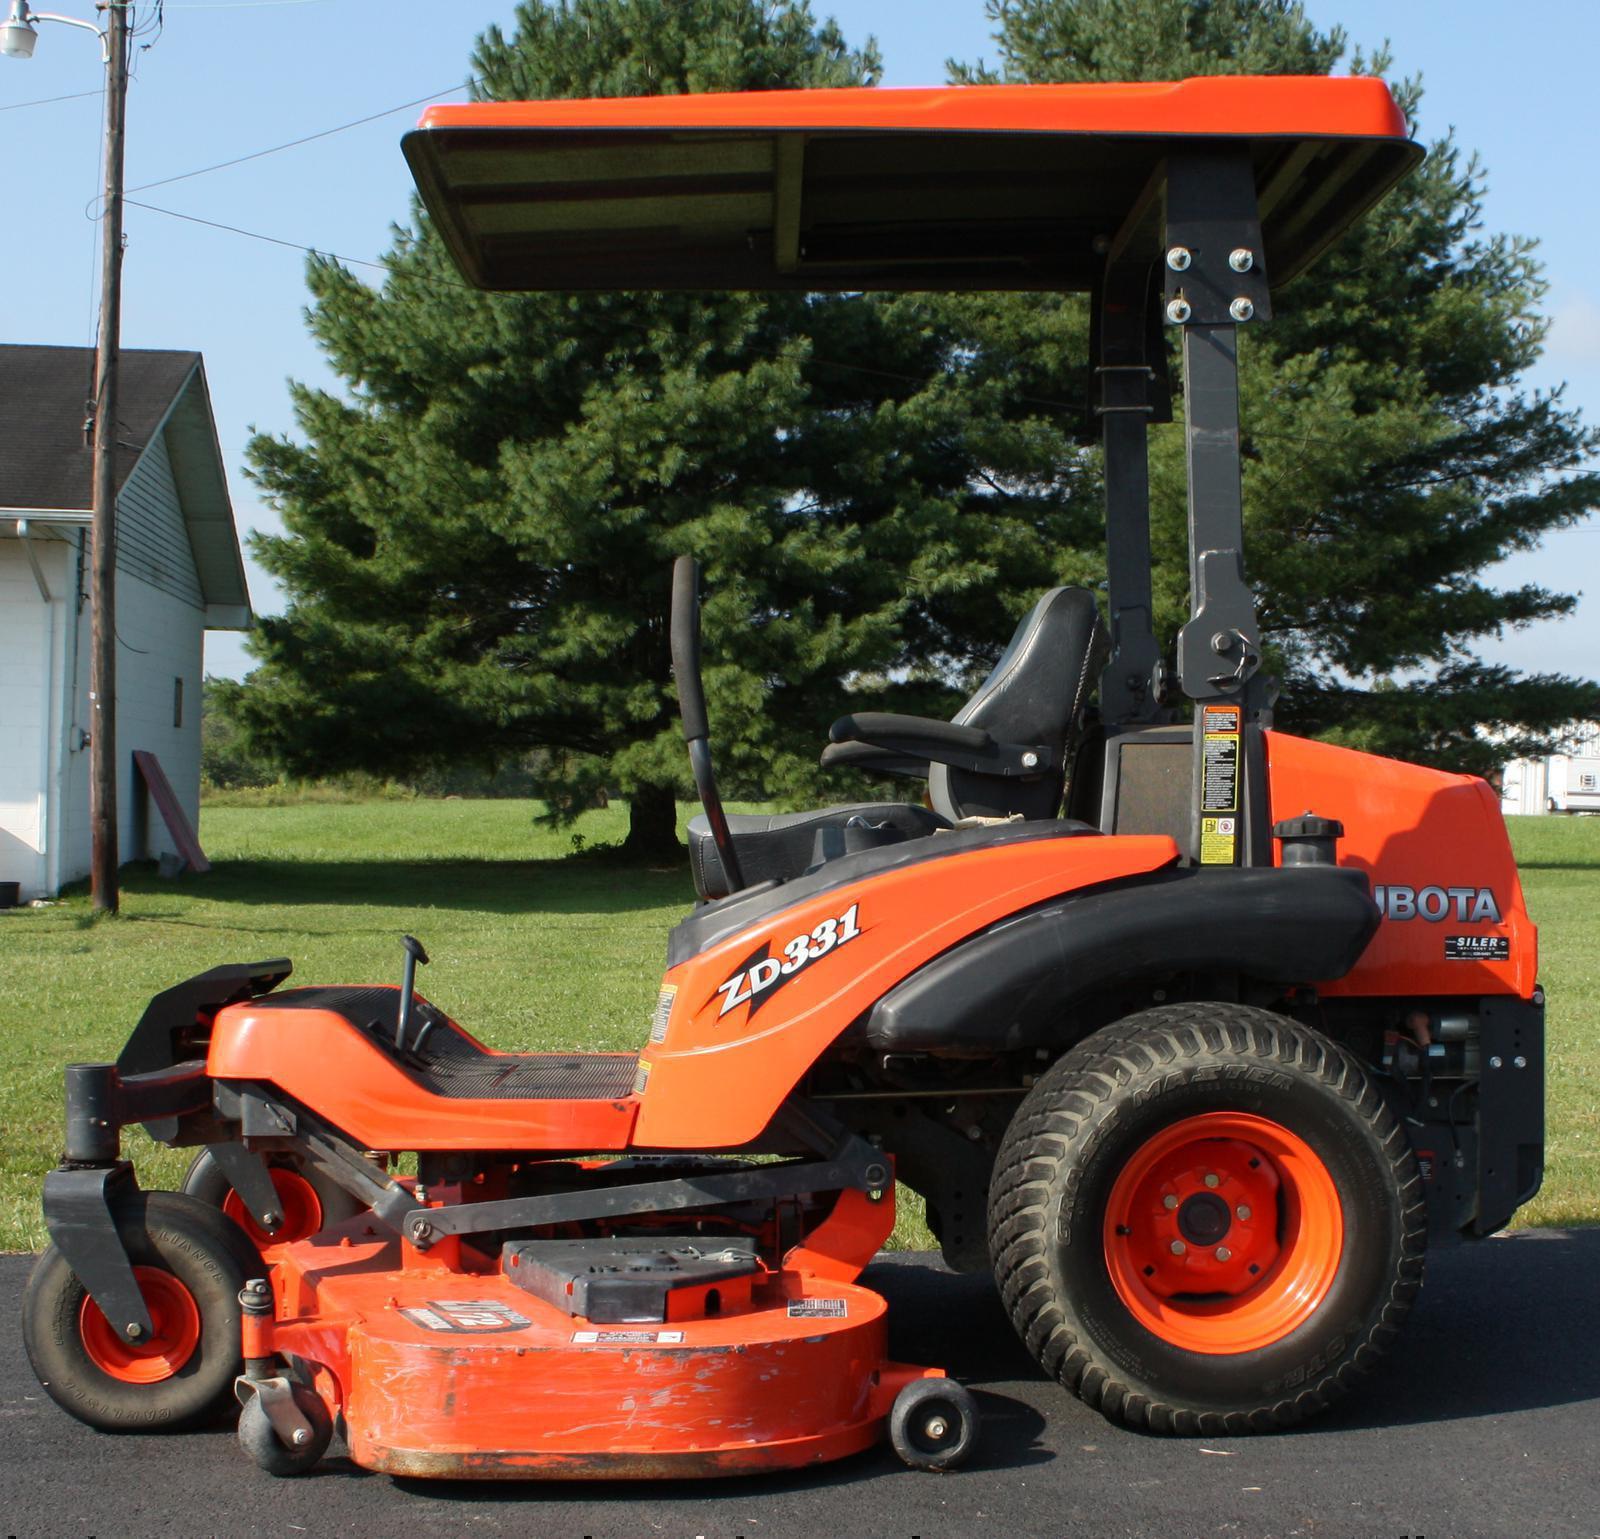 Kubota tractors for sale in kentucky - Kubota